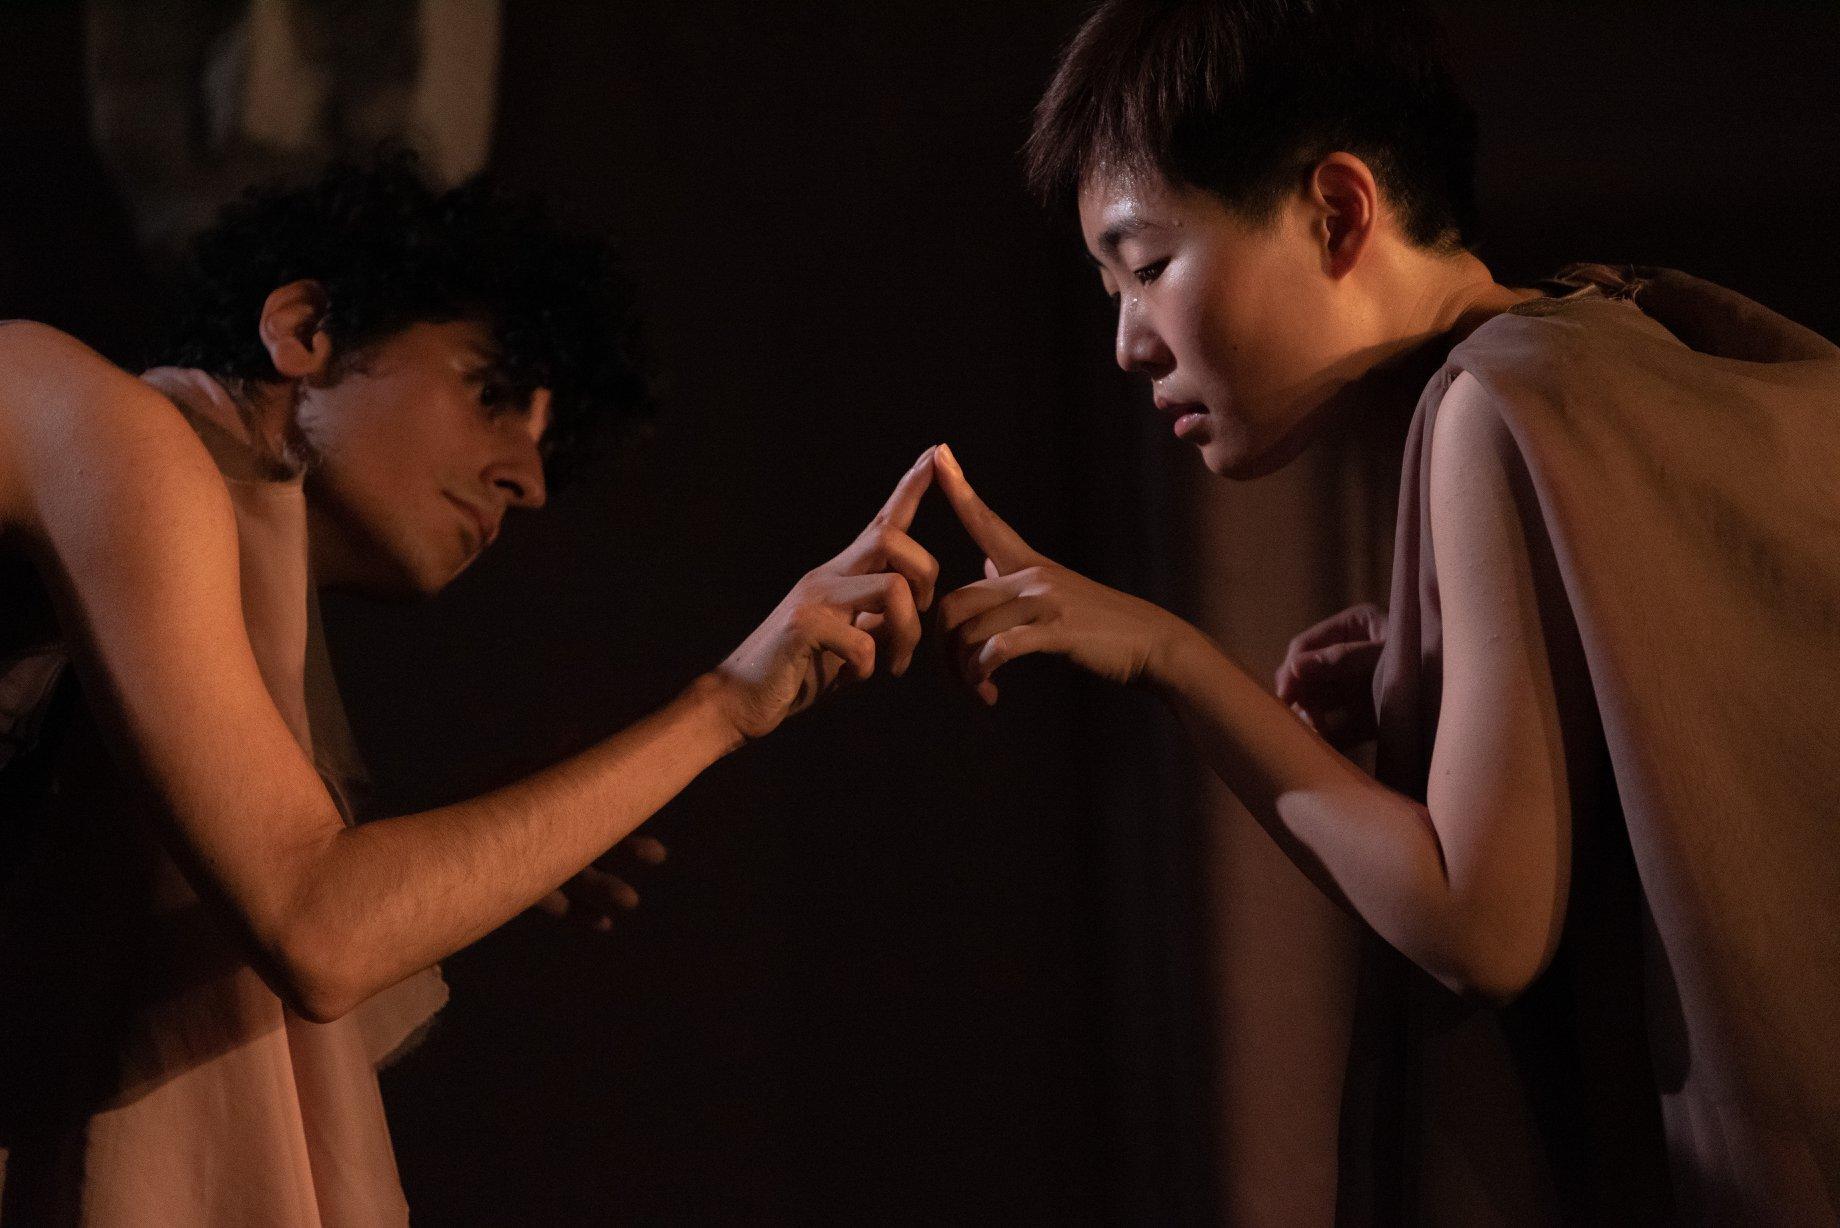 Benjamin Benne and Jisun Kim in benjisun presents bodyssey, Yale Cabaret, Oct 3-5, 2019 (Blaq Pearl Photography)